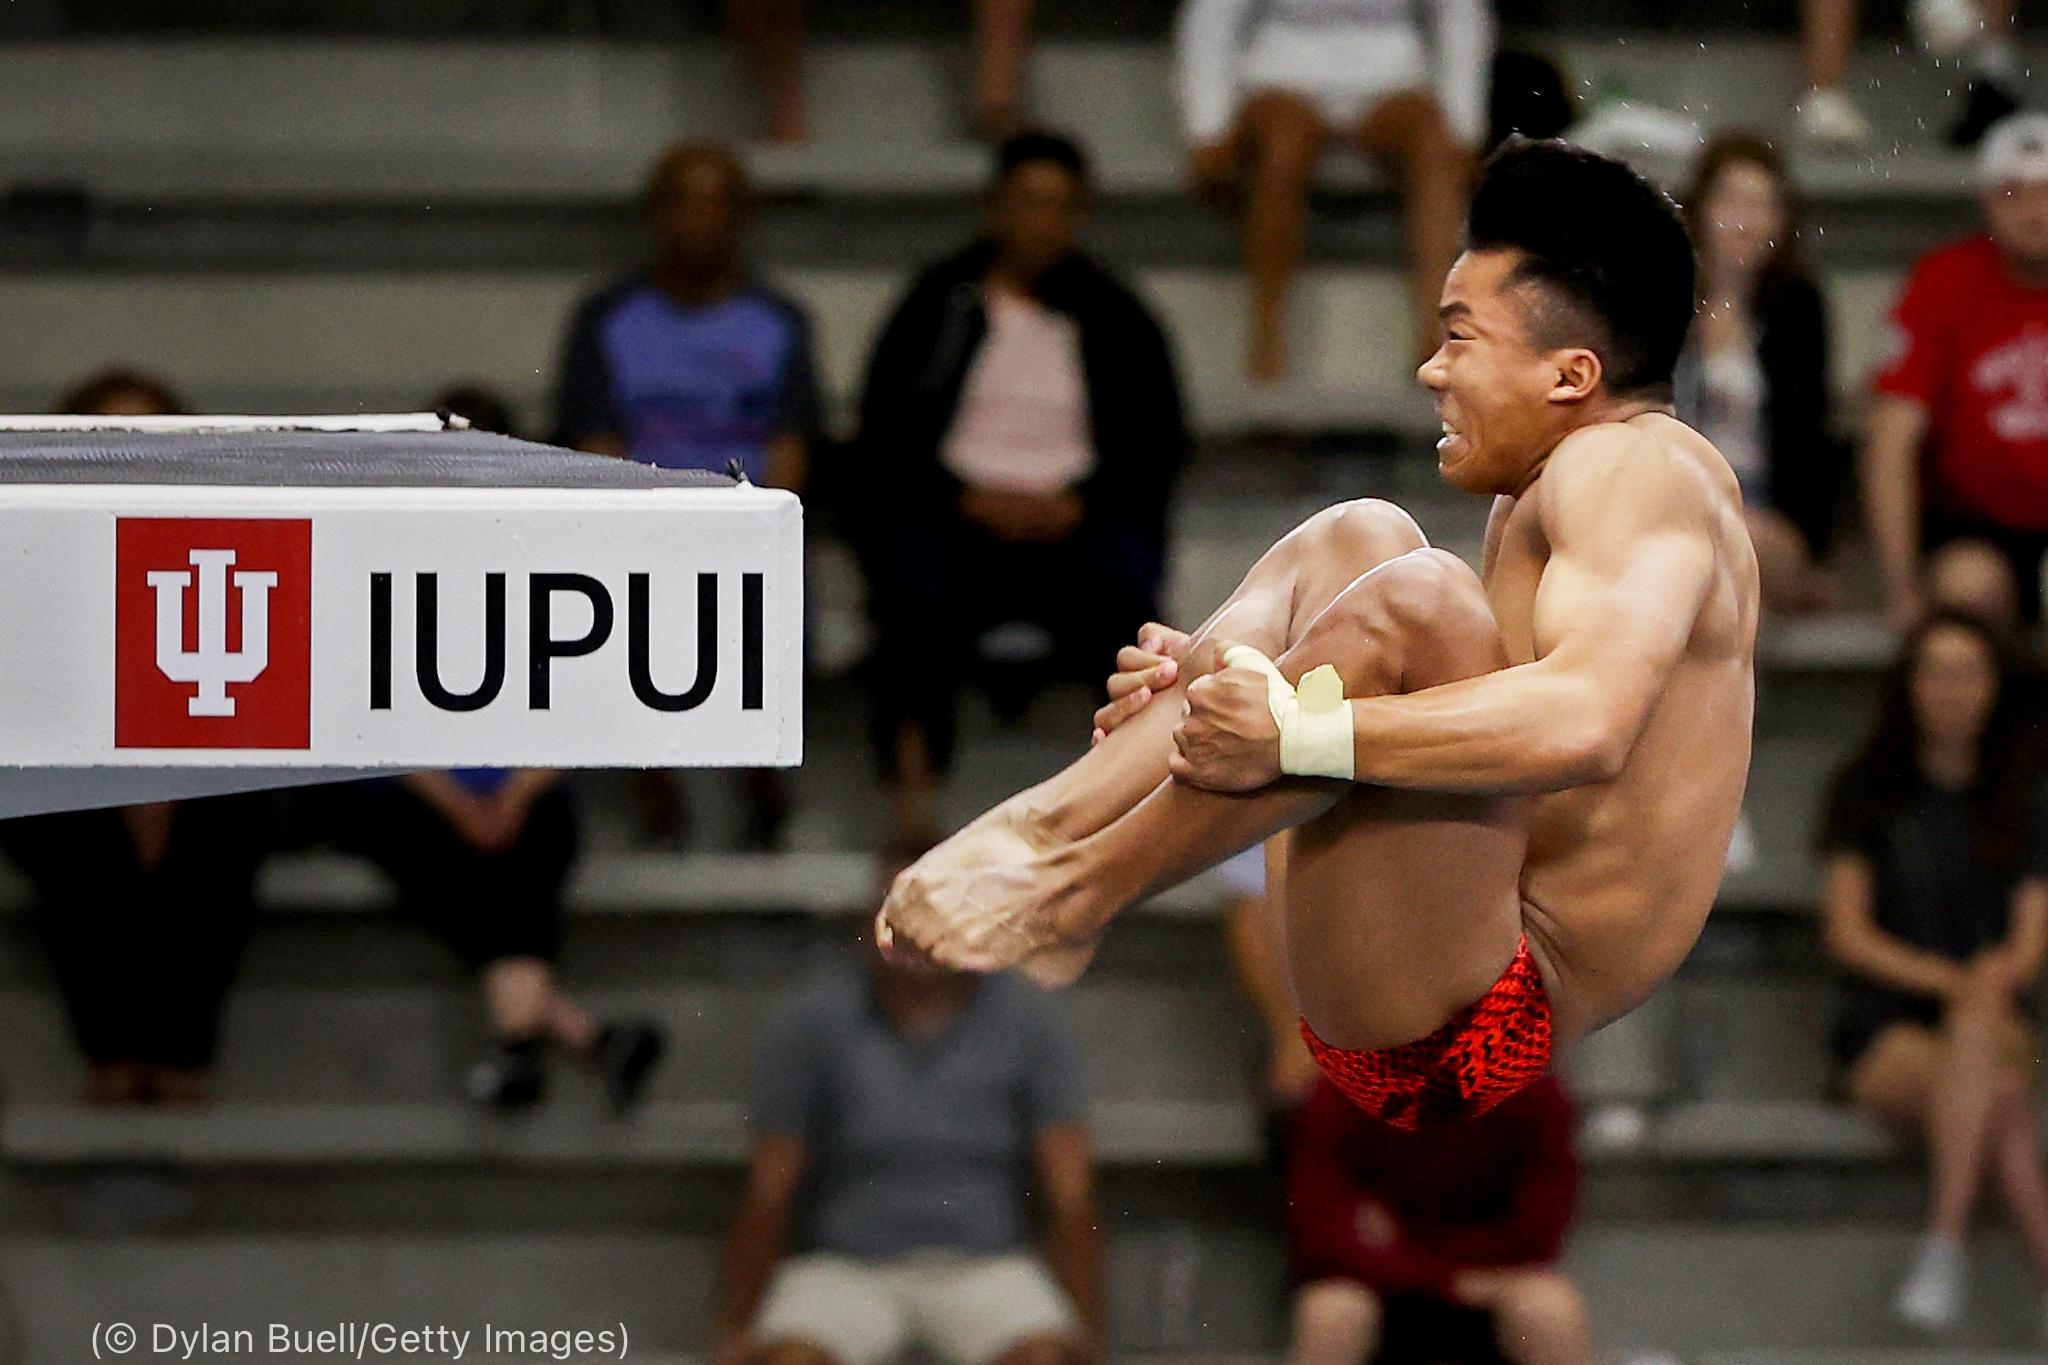 Hombre lanzándose en un salto (© Dylan Buell/Getty Images)